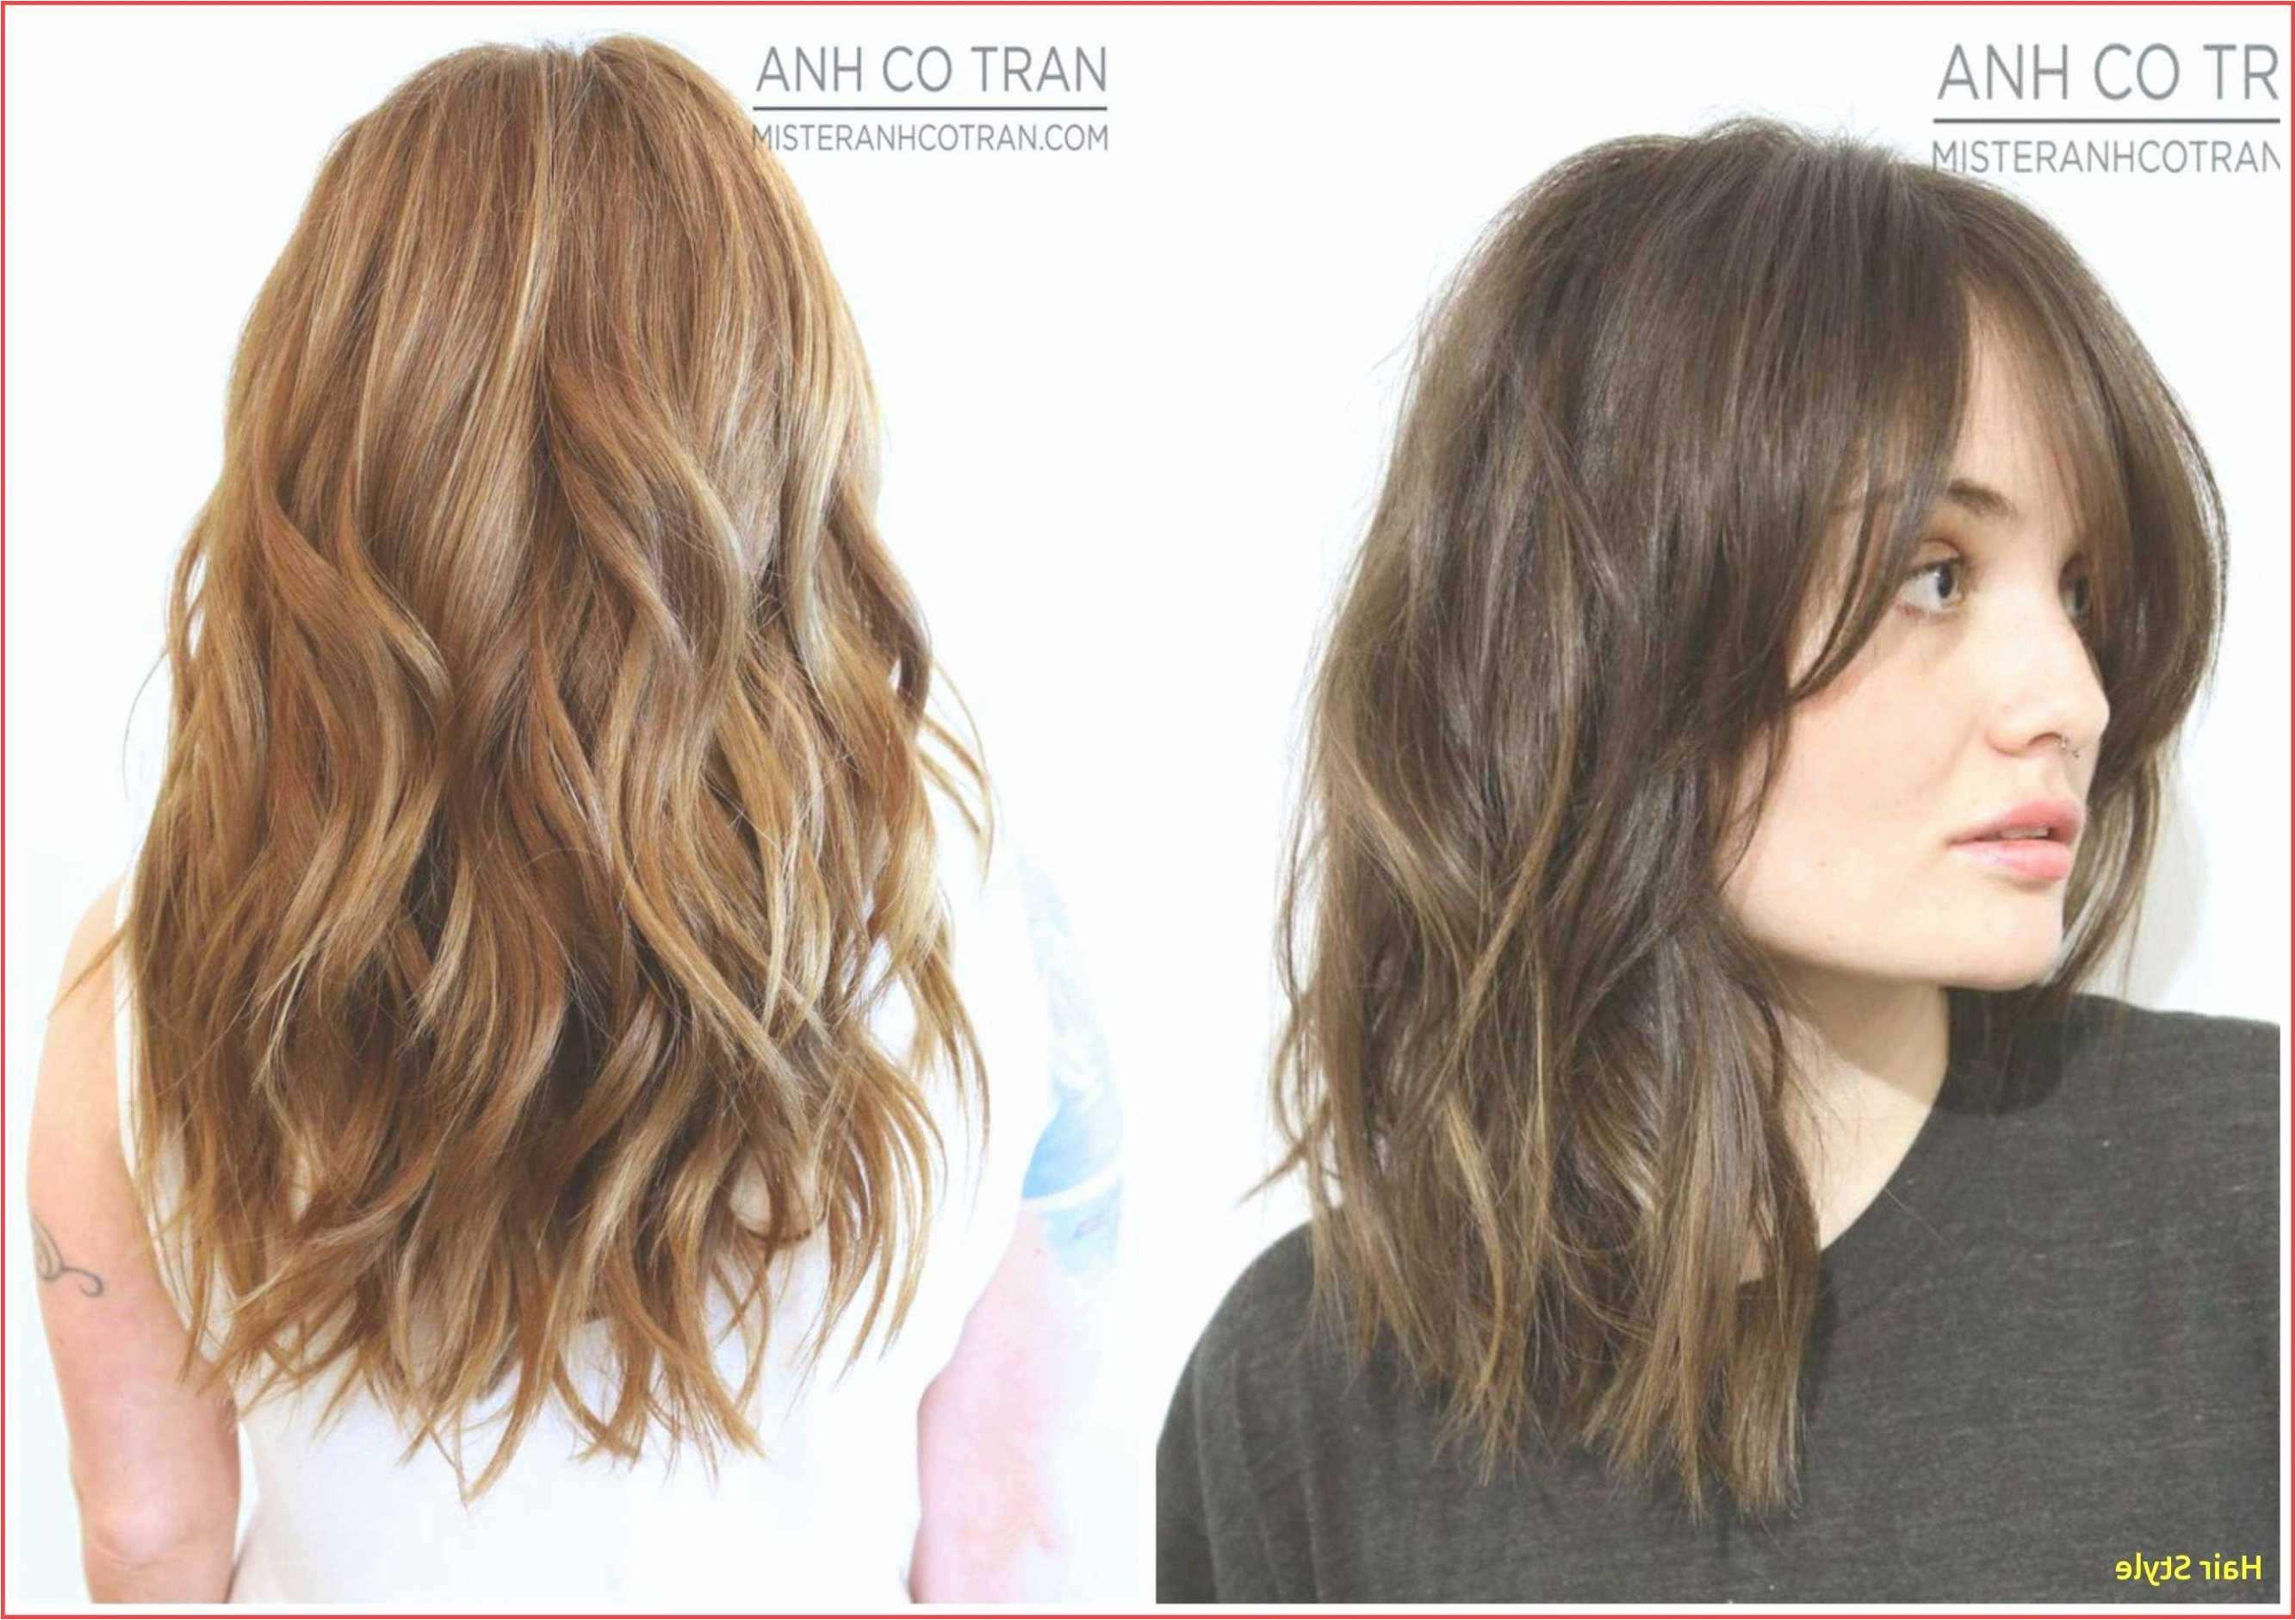 Asian Hairstyles for Long Hair Fresh New Short Wavy asian Hairstyles – Uternity Asian Hairstyles